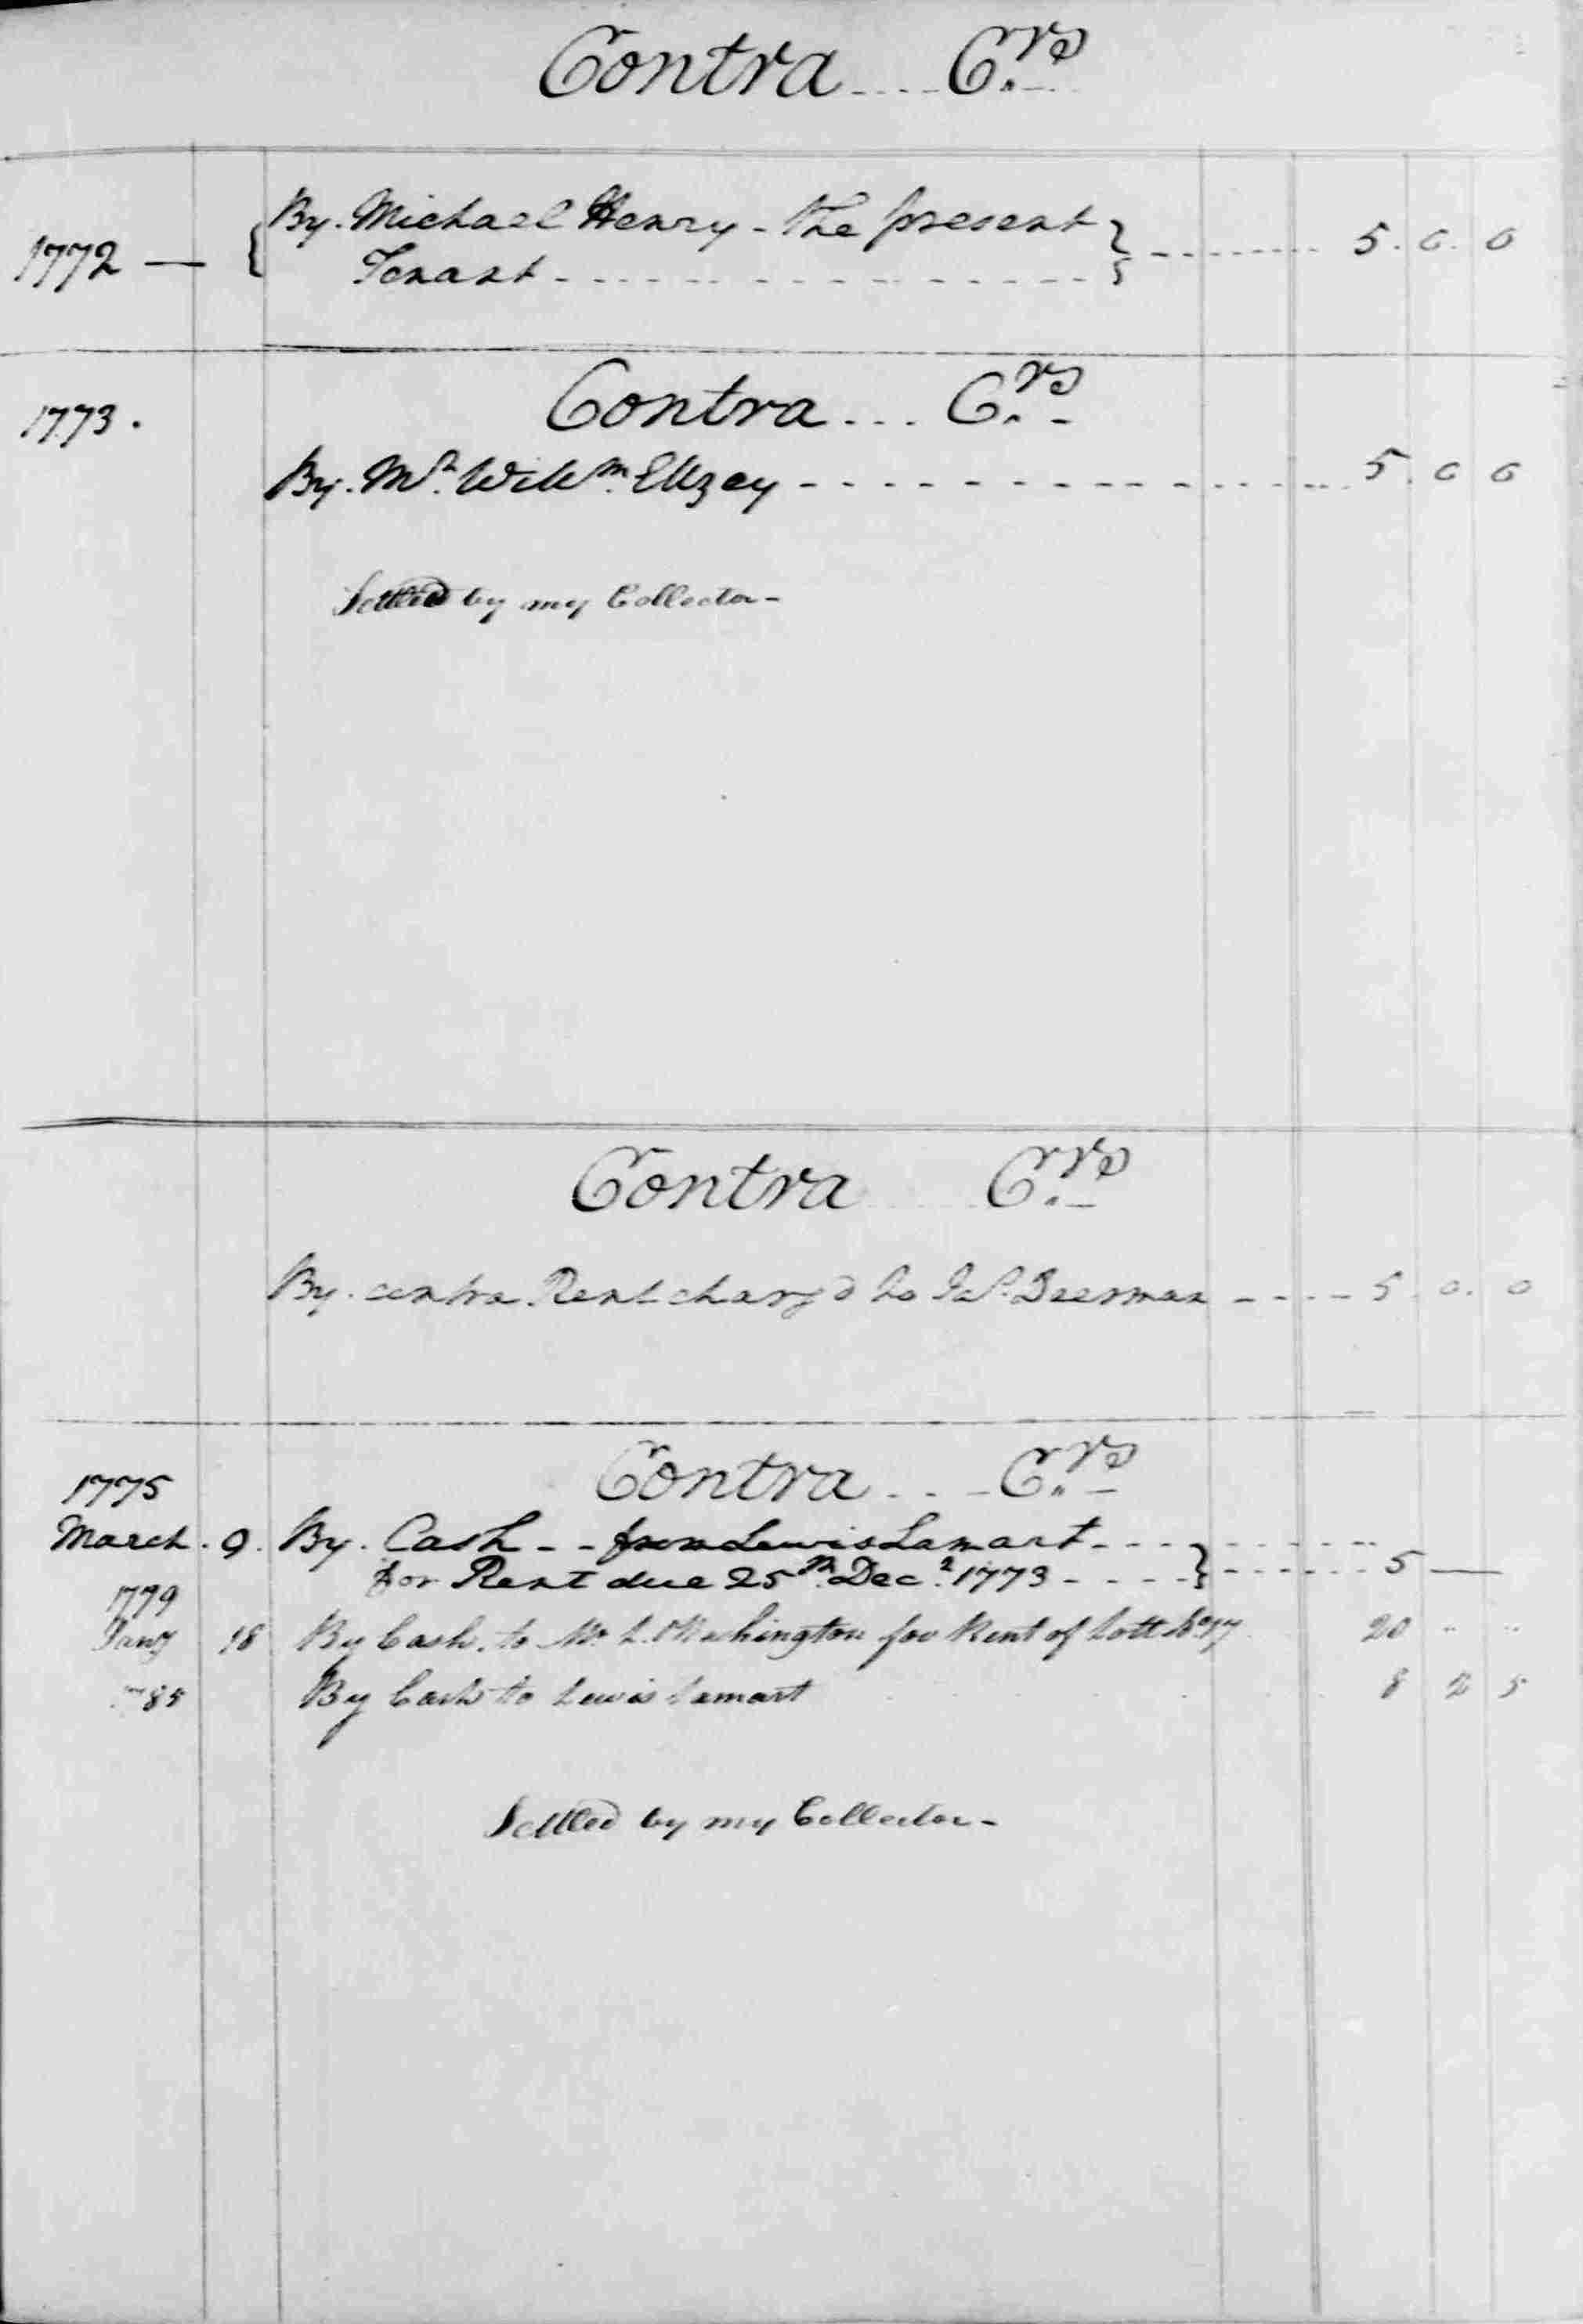 Ledger B, folio 69, right side